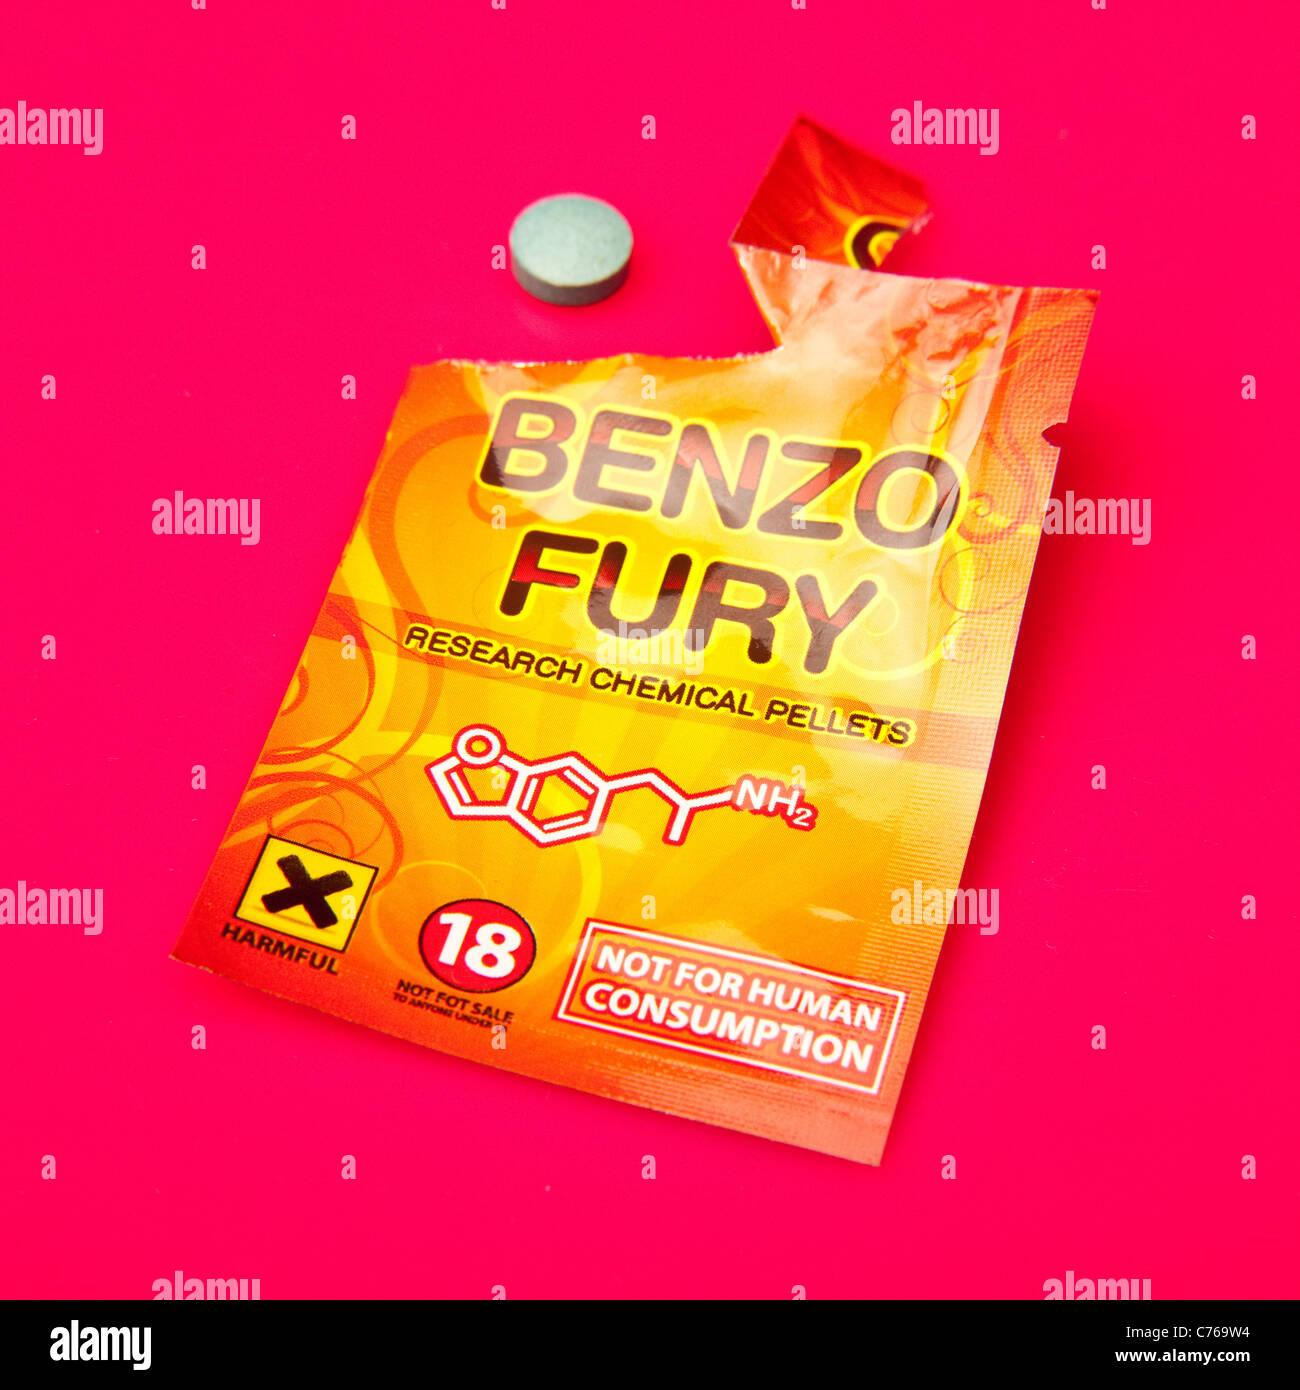 Buy benzo fury pellets online dating